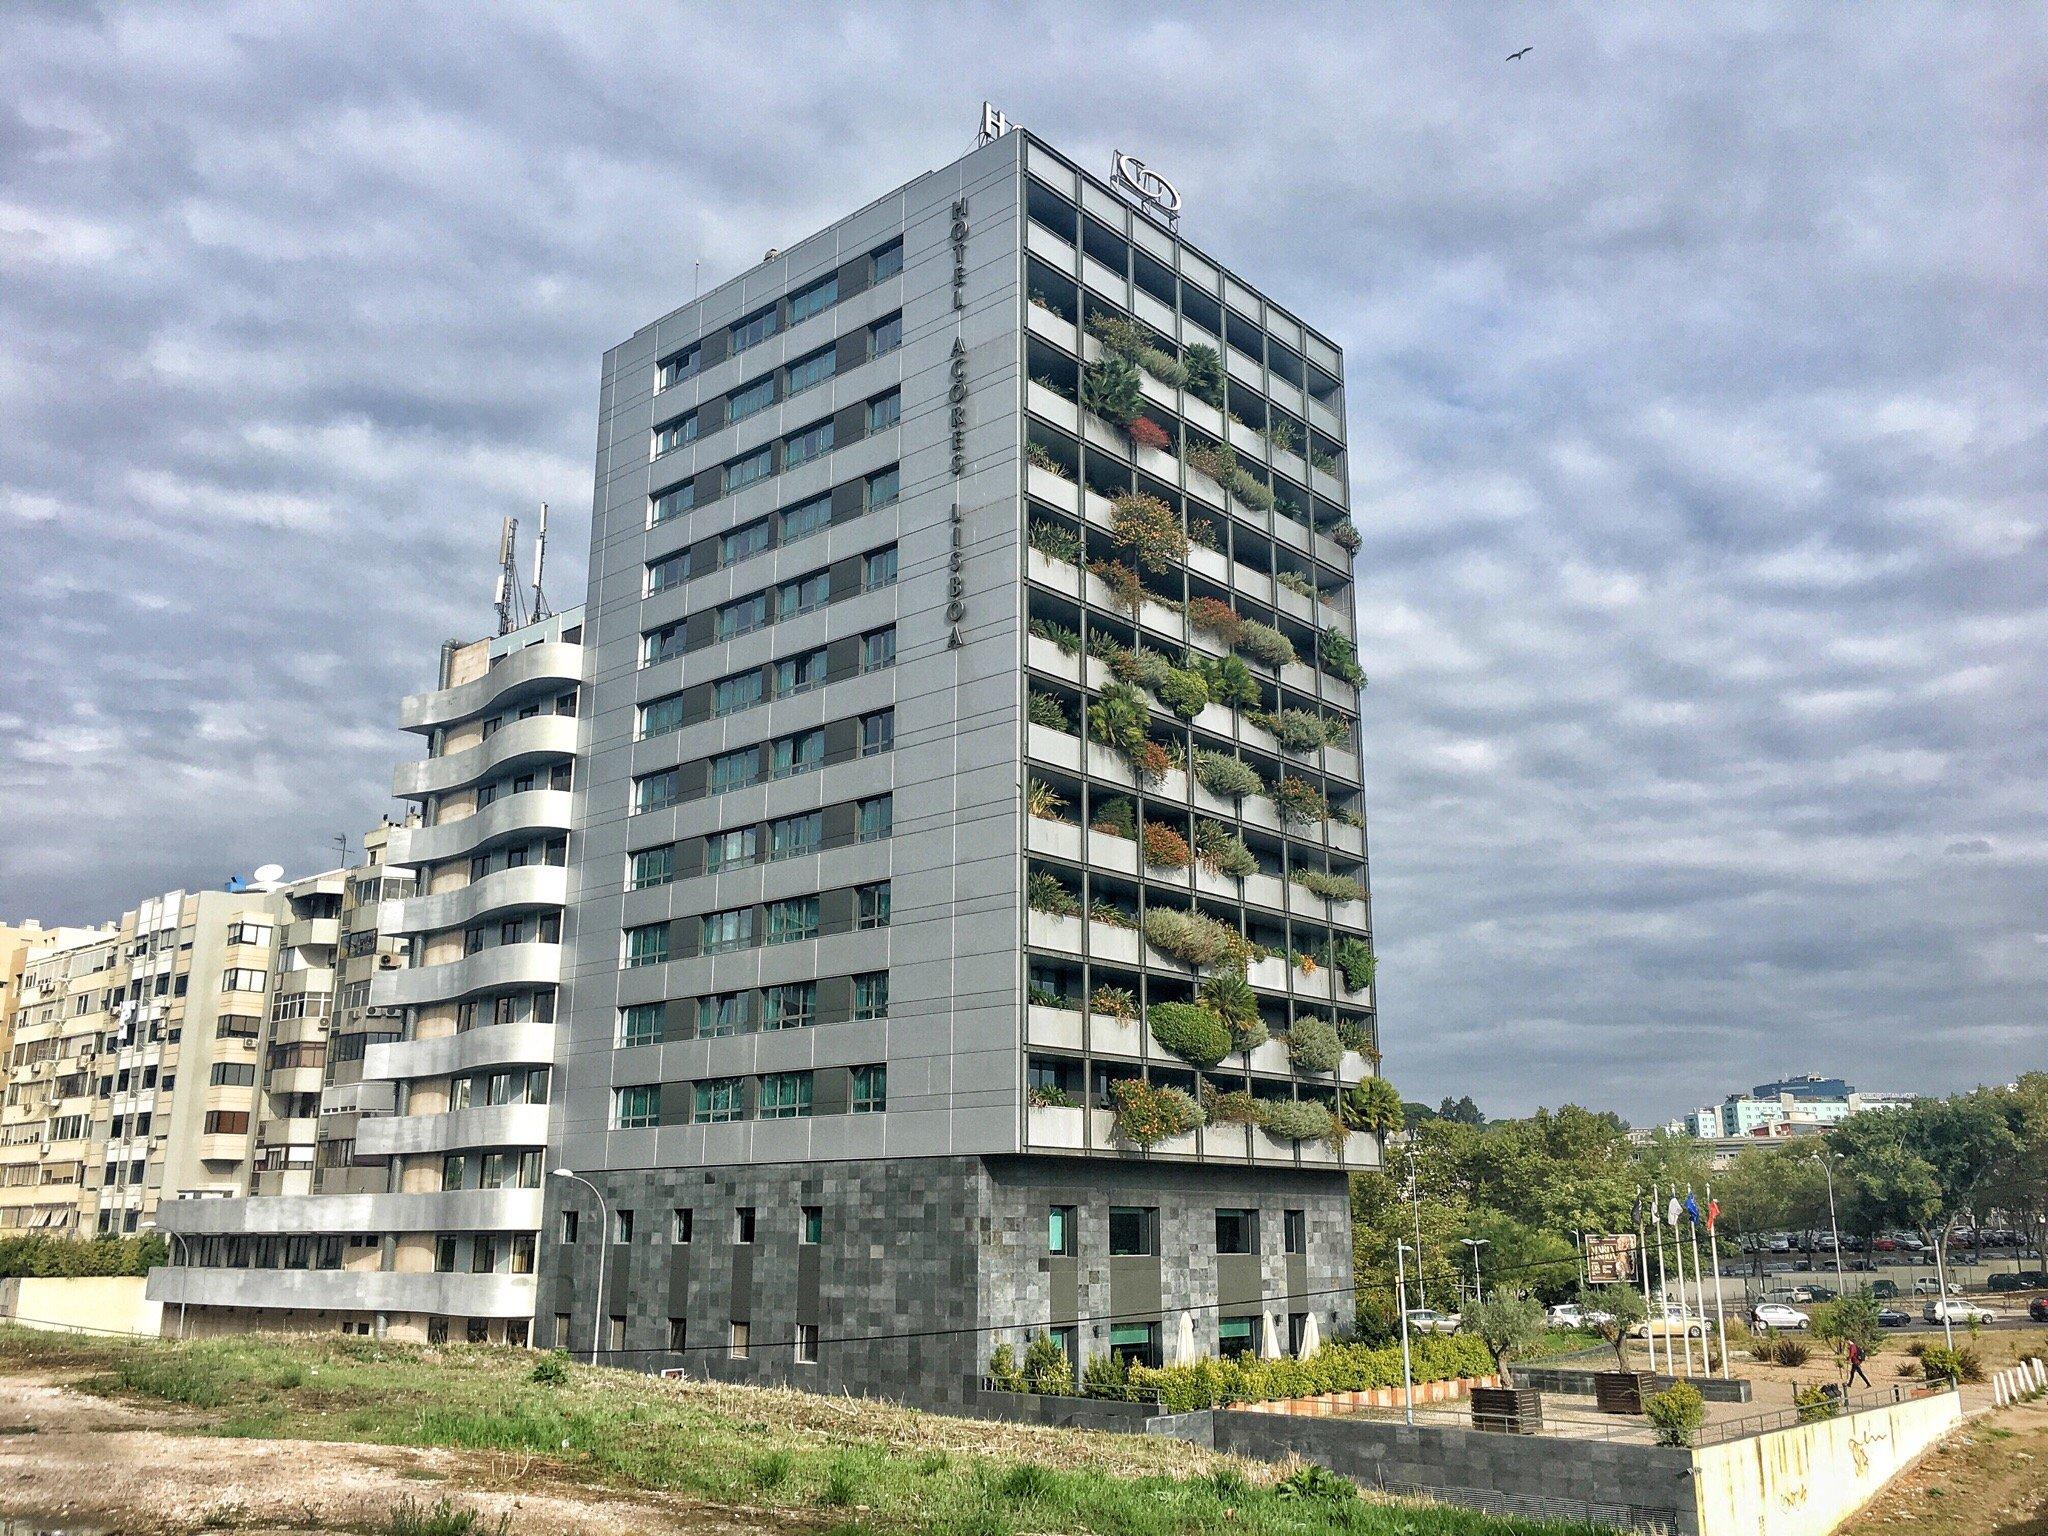 Hotel Acores Lisboa